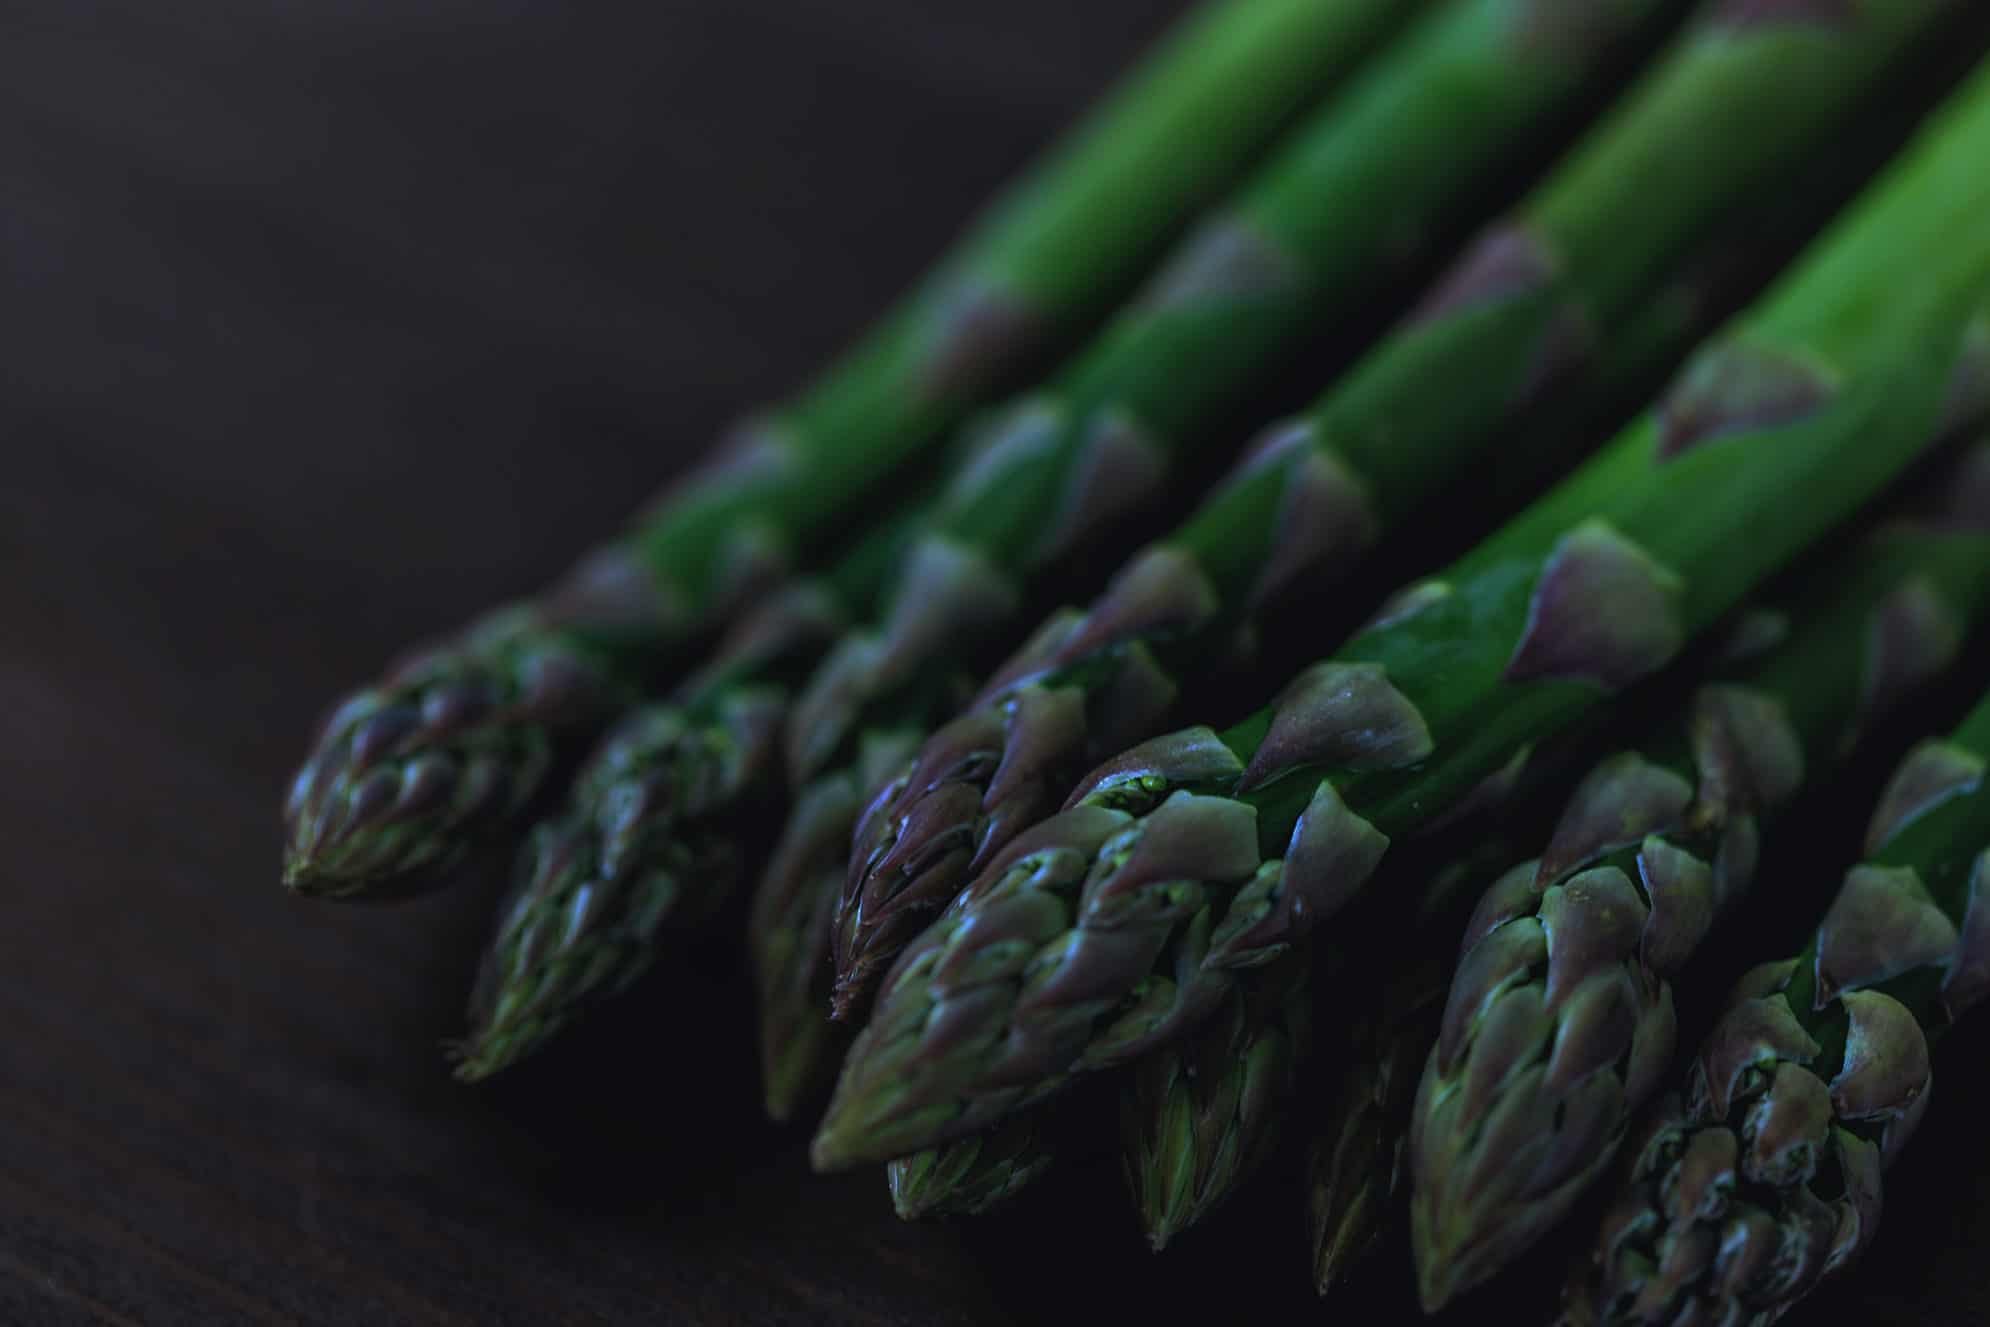 asparagusDARK